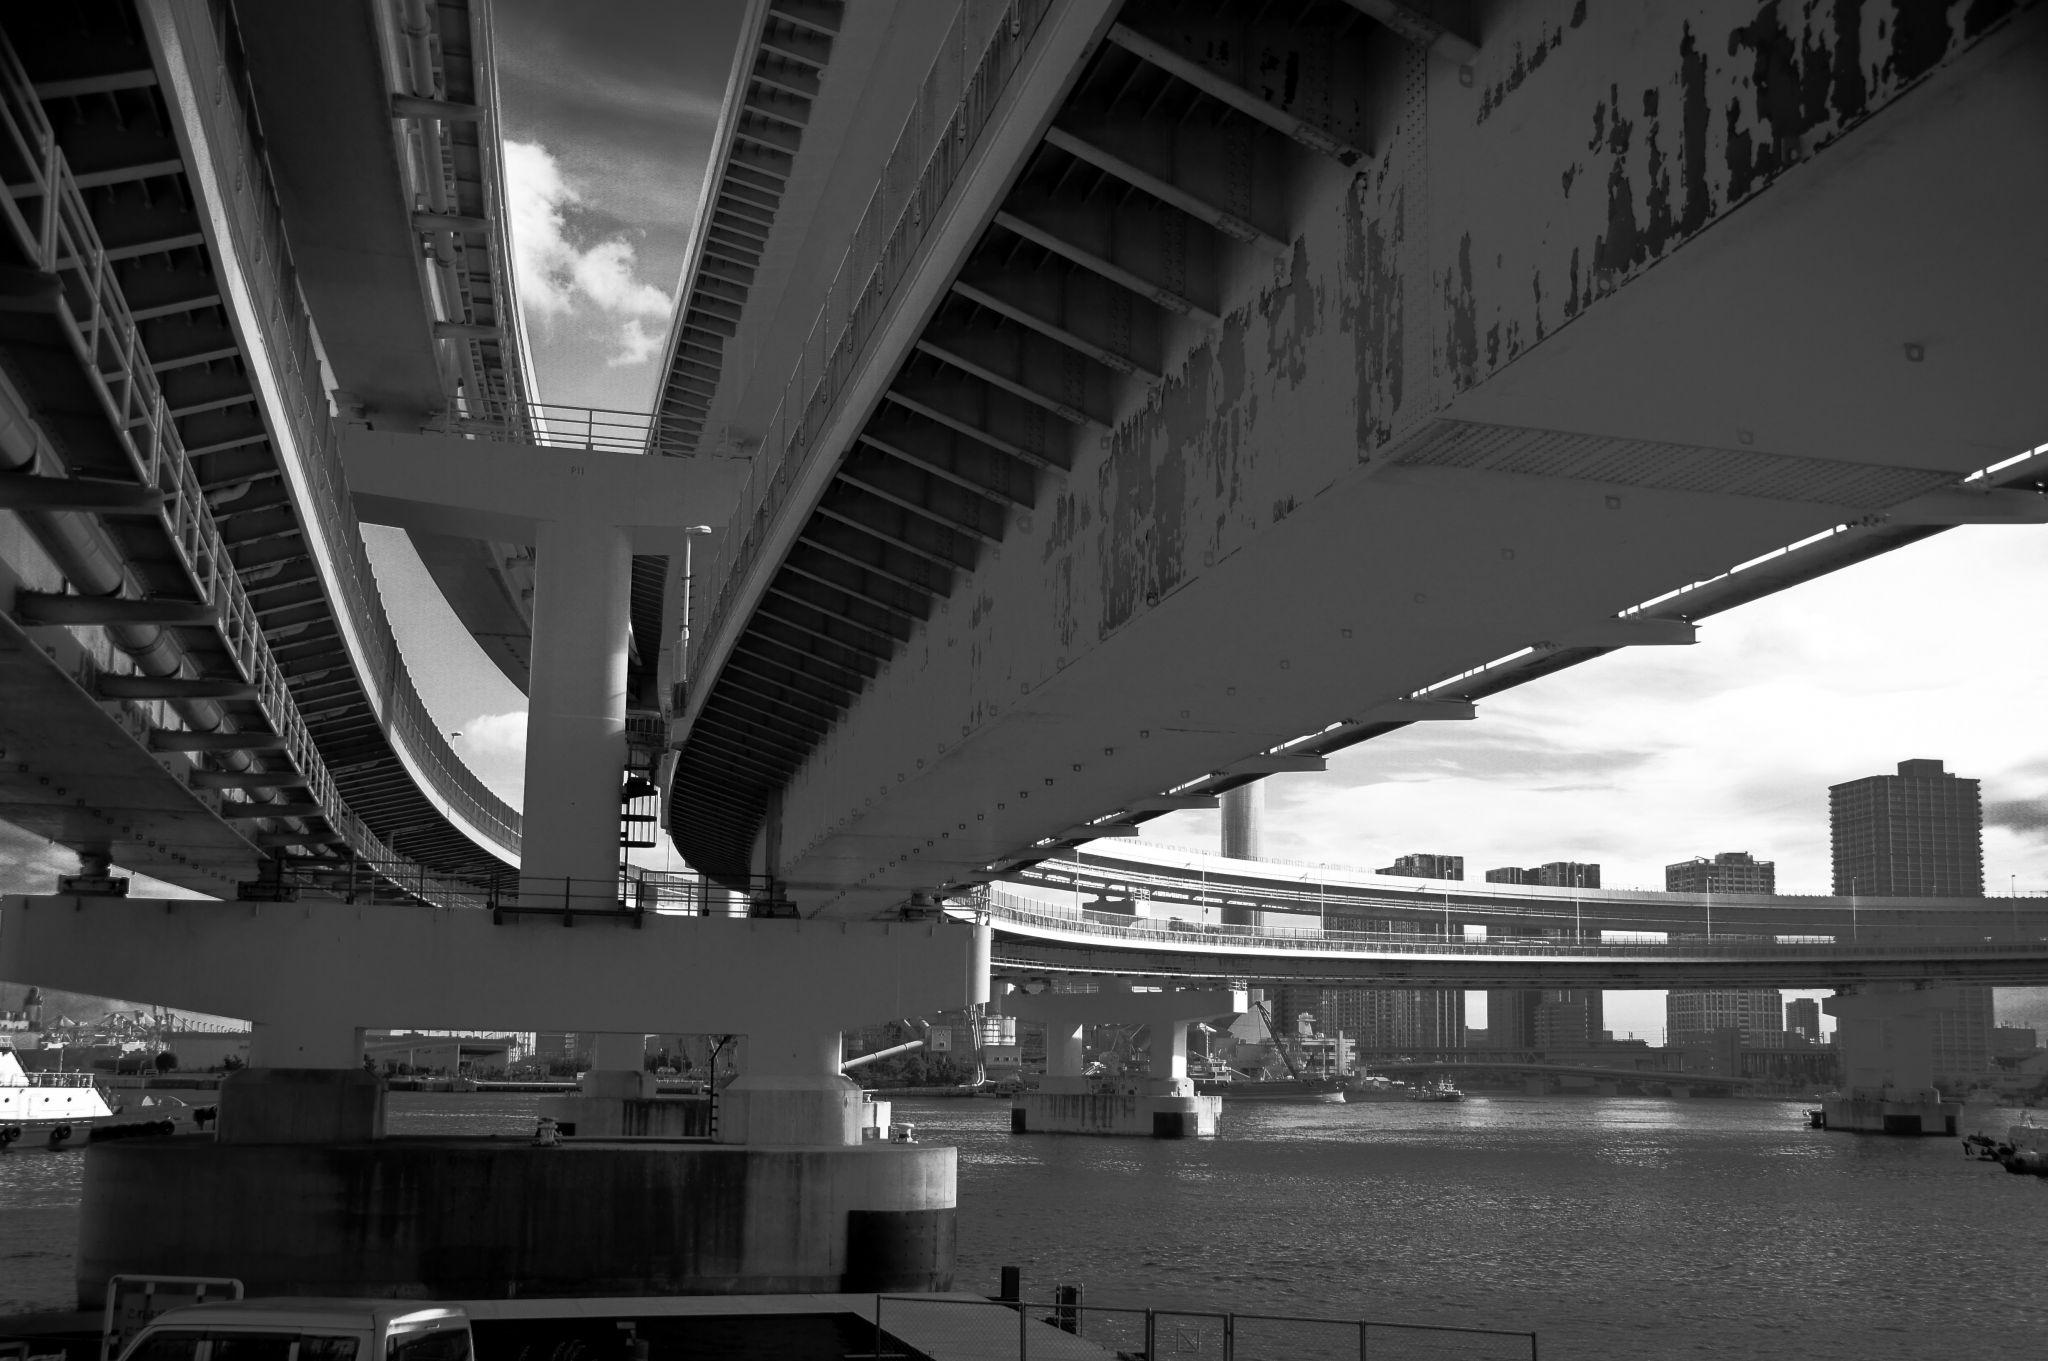 Rainbow Bridge ramp, Japan